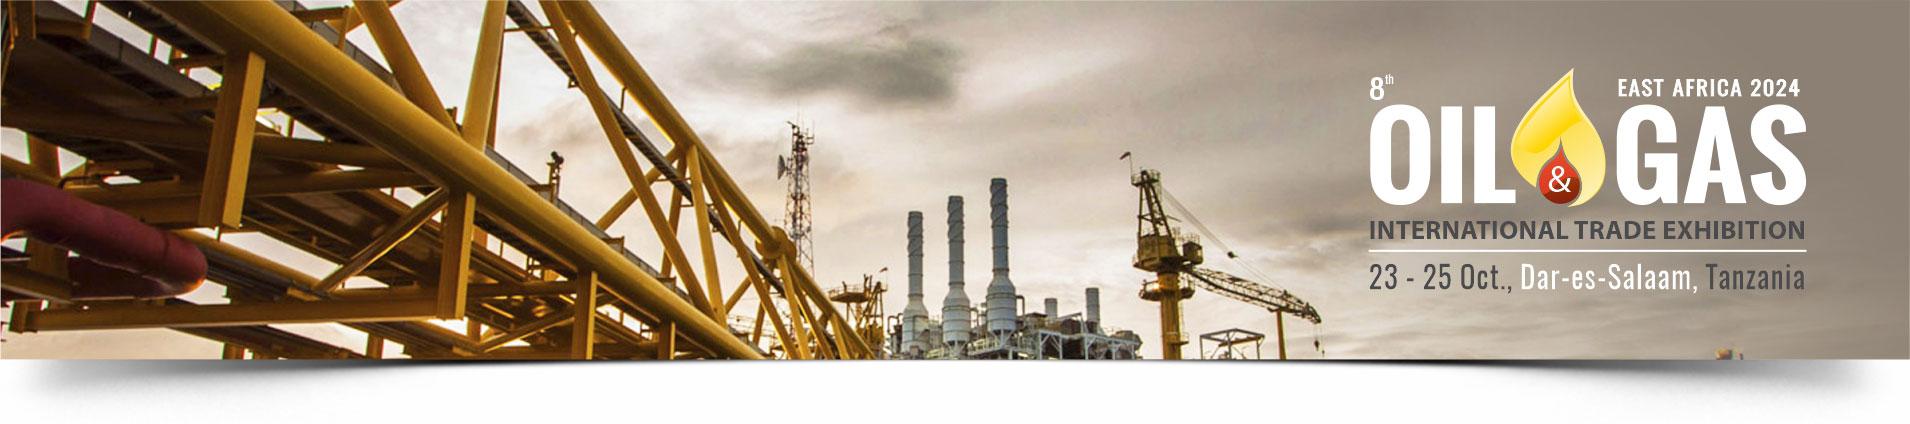 Event News | Oil & Gas Tanzania 2019